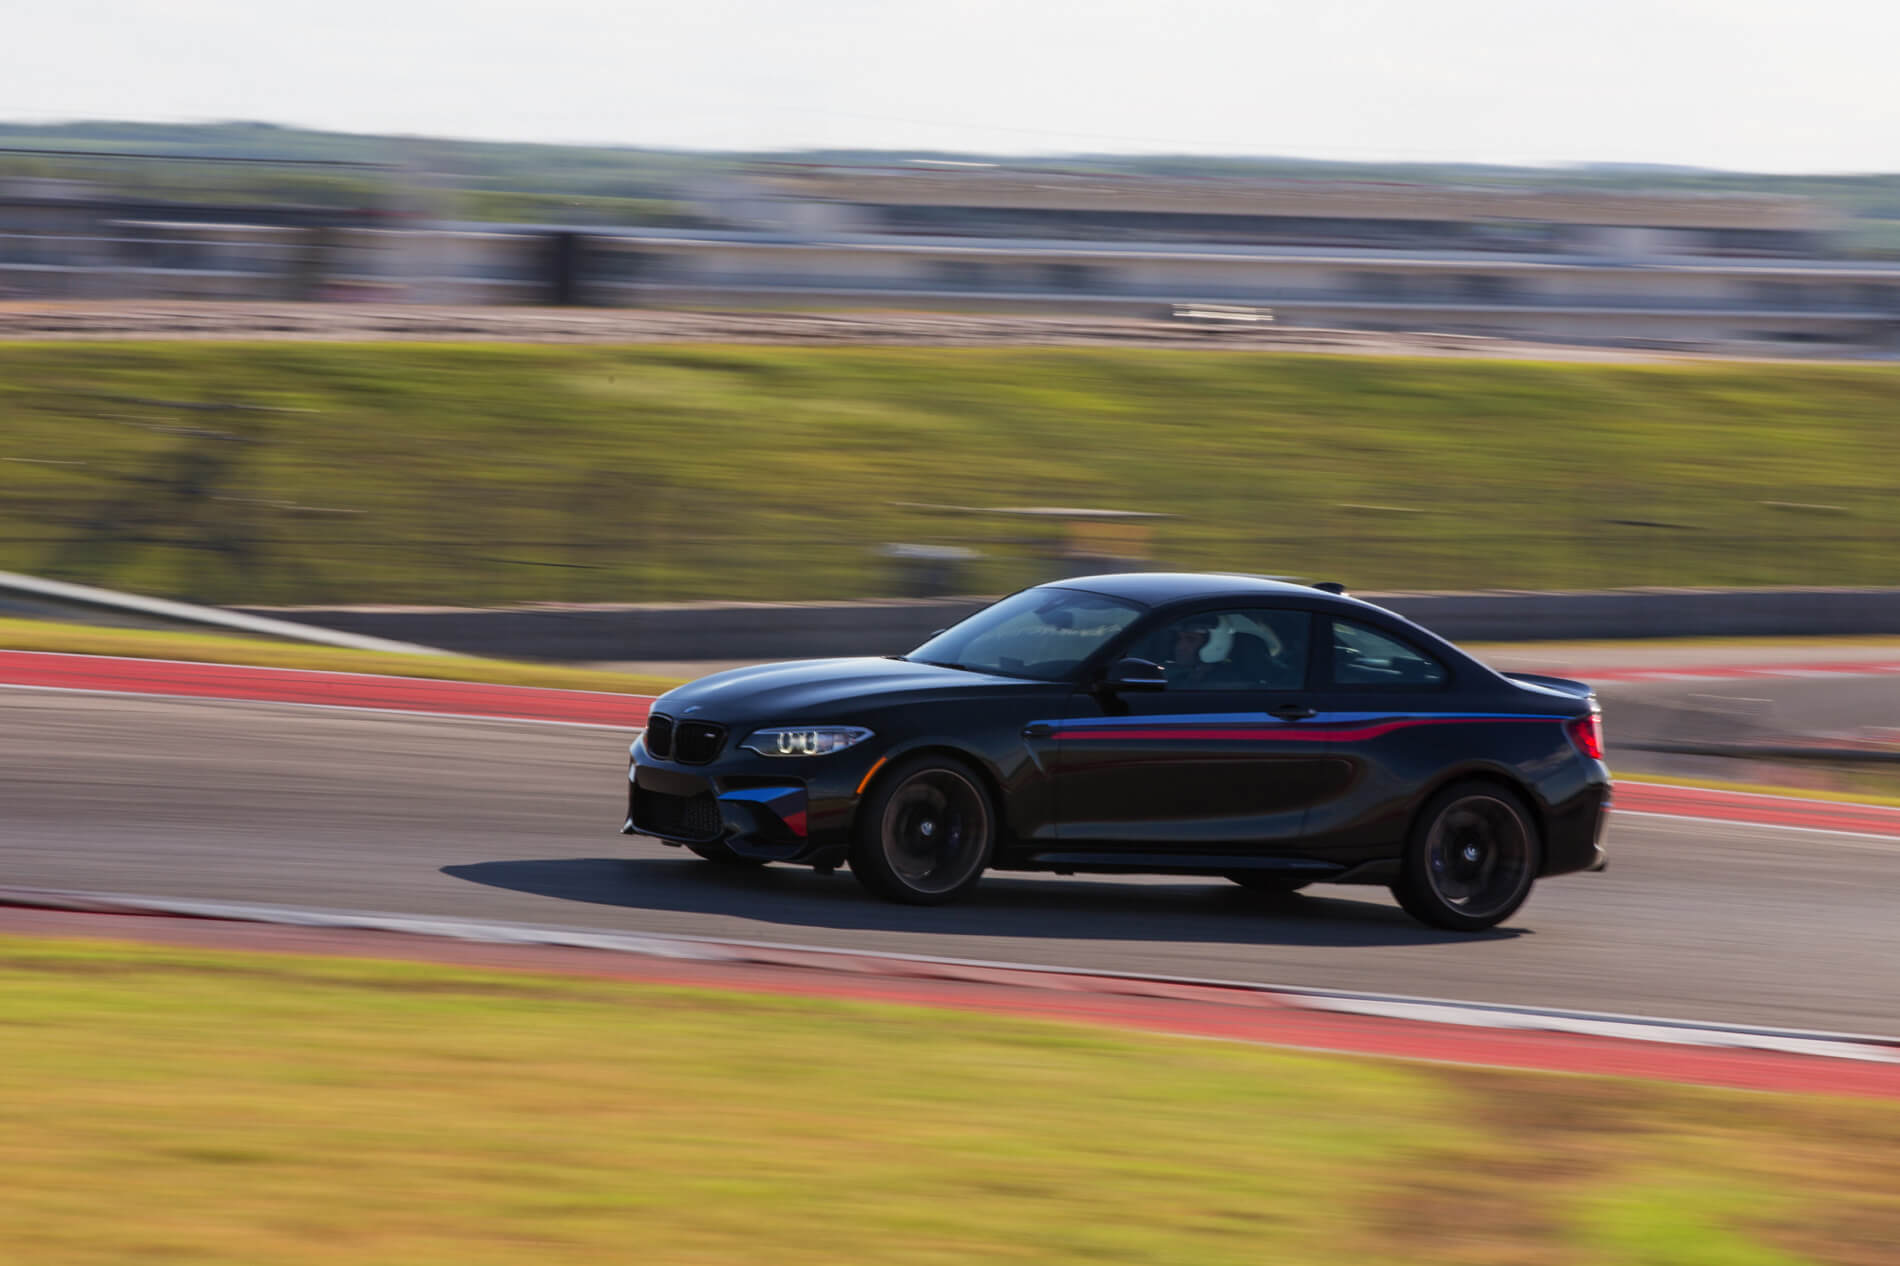 BMW-M-Track-Days-Austin-2017-74.jpg